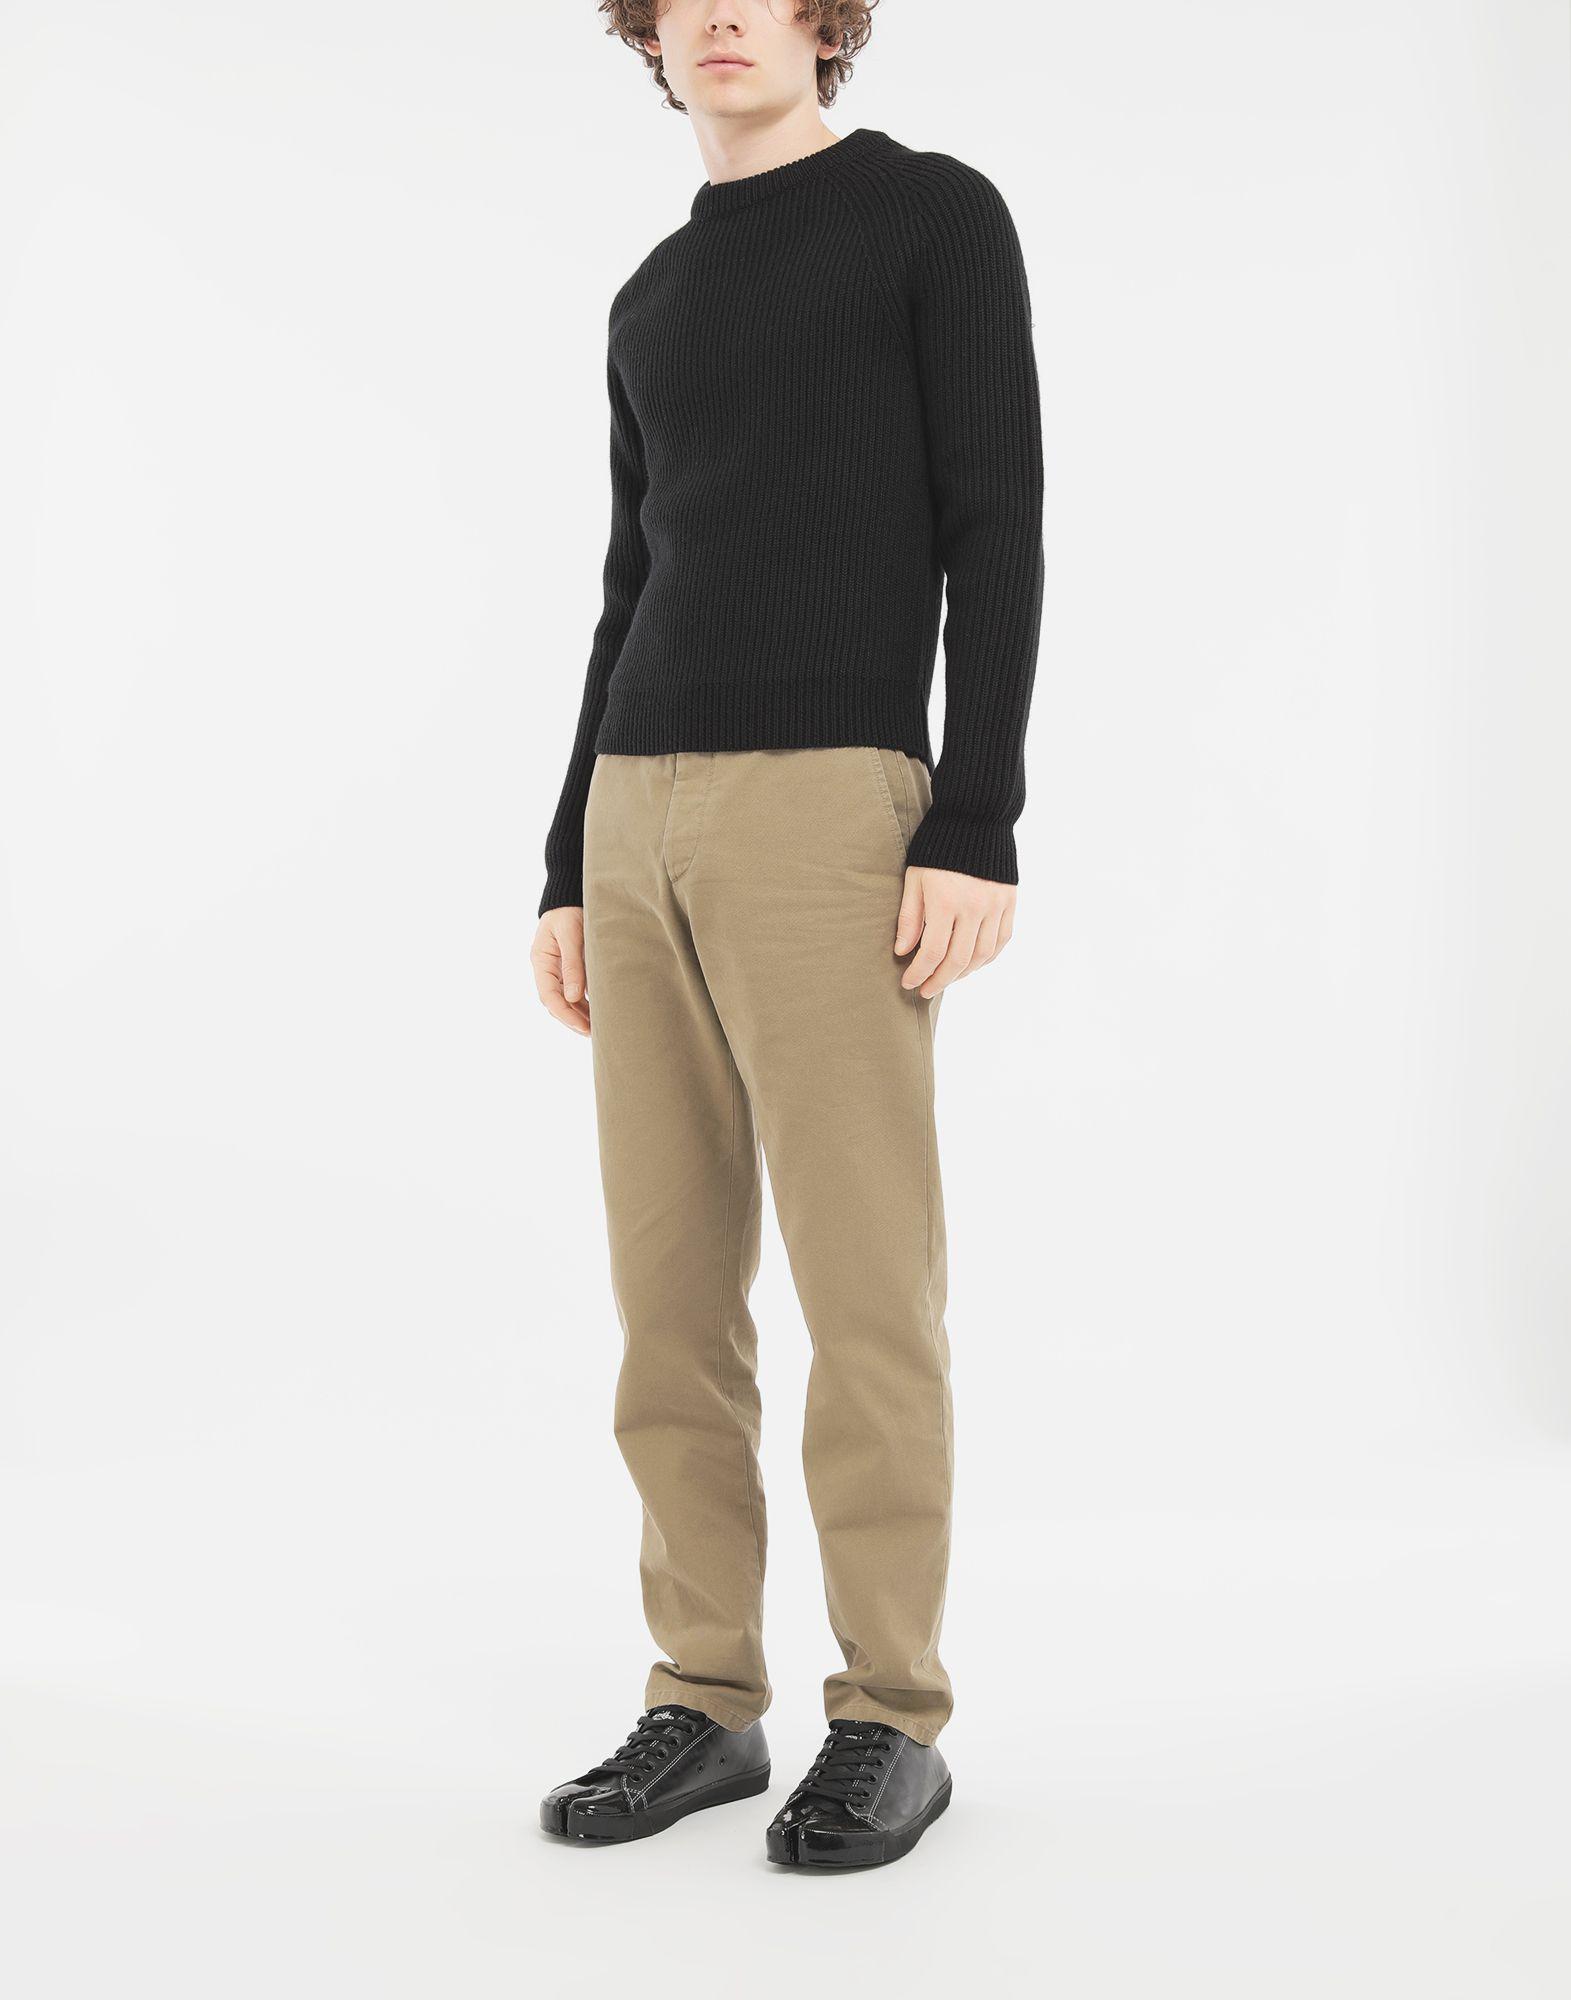 MAISON MARGIELA Ribbed sweater Crewneck Man d